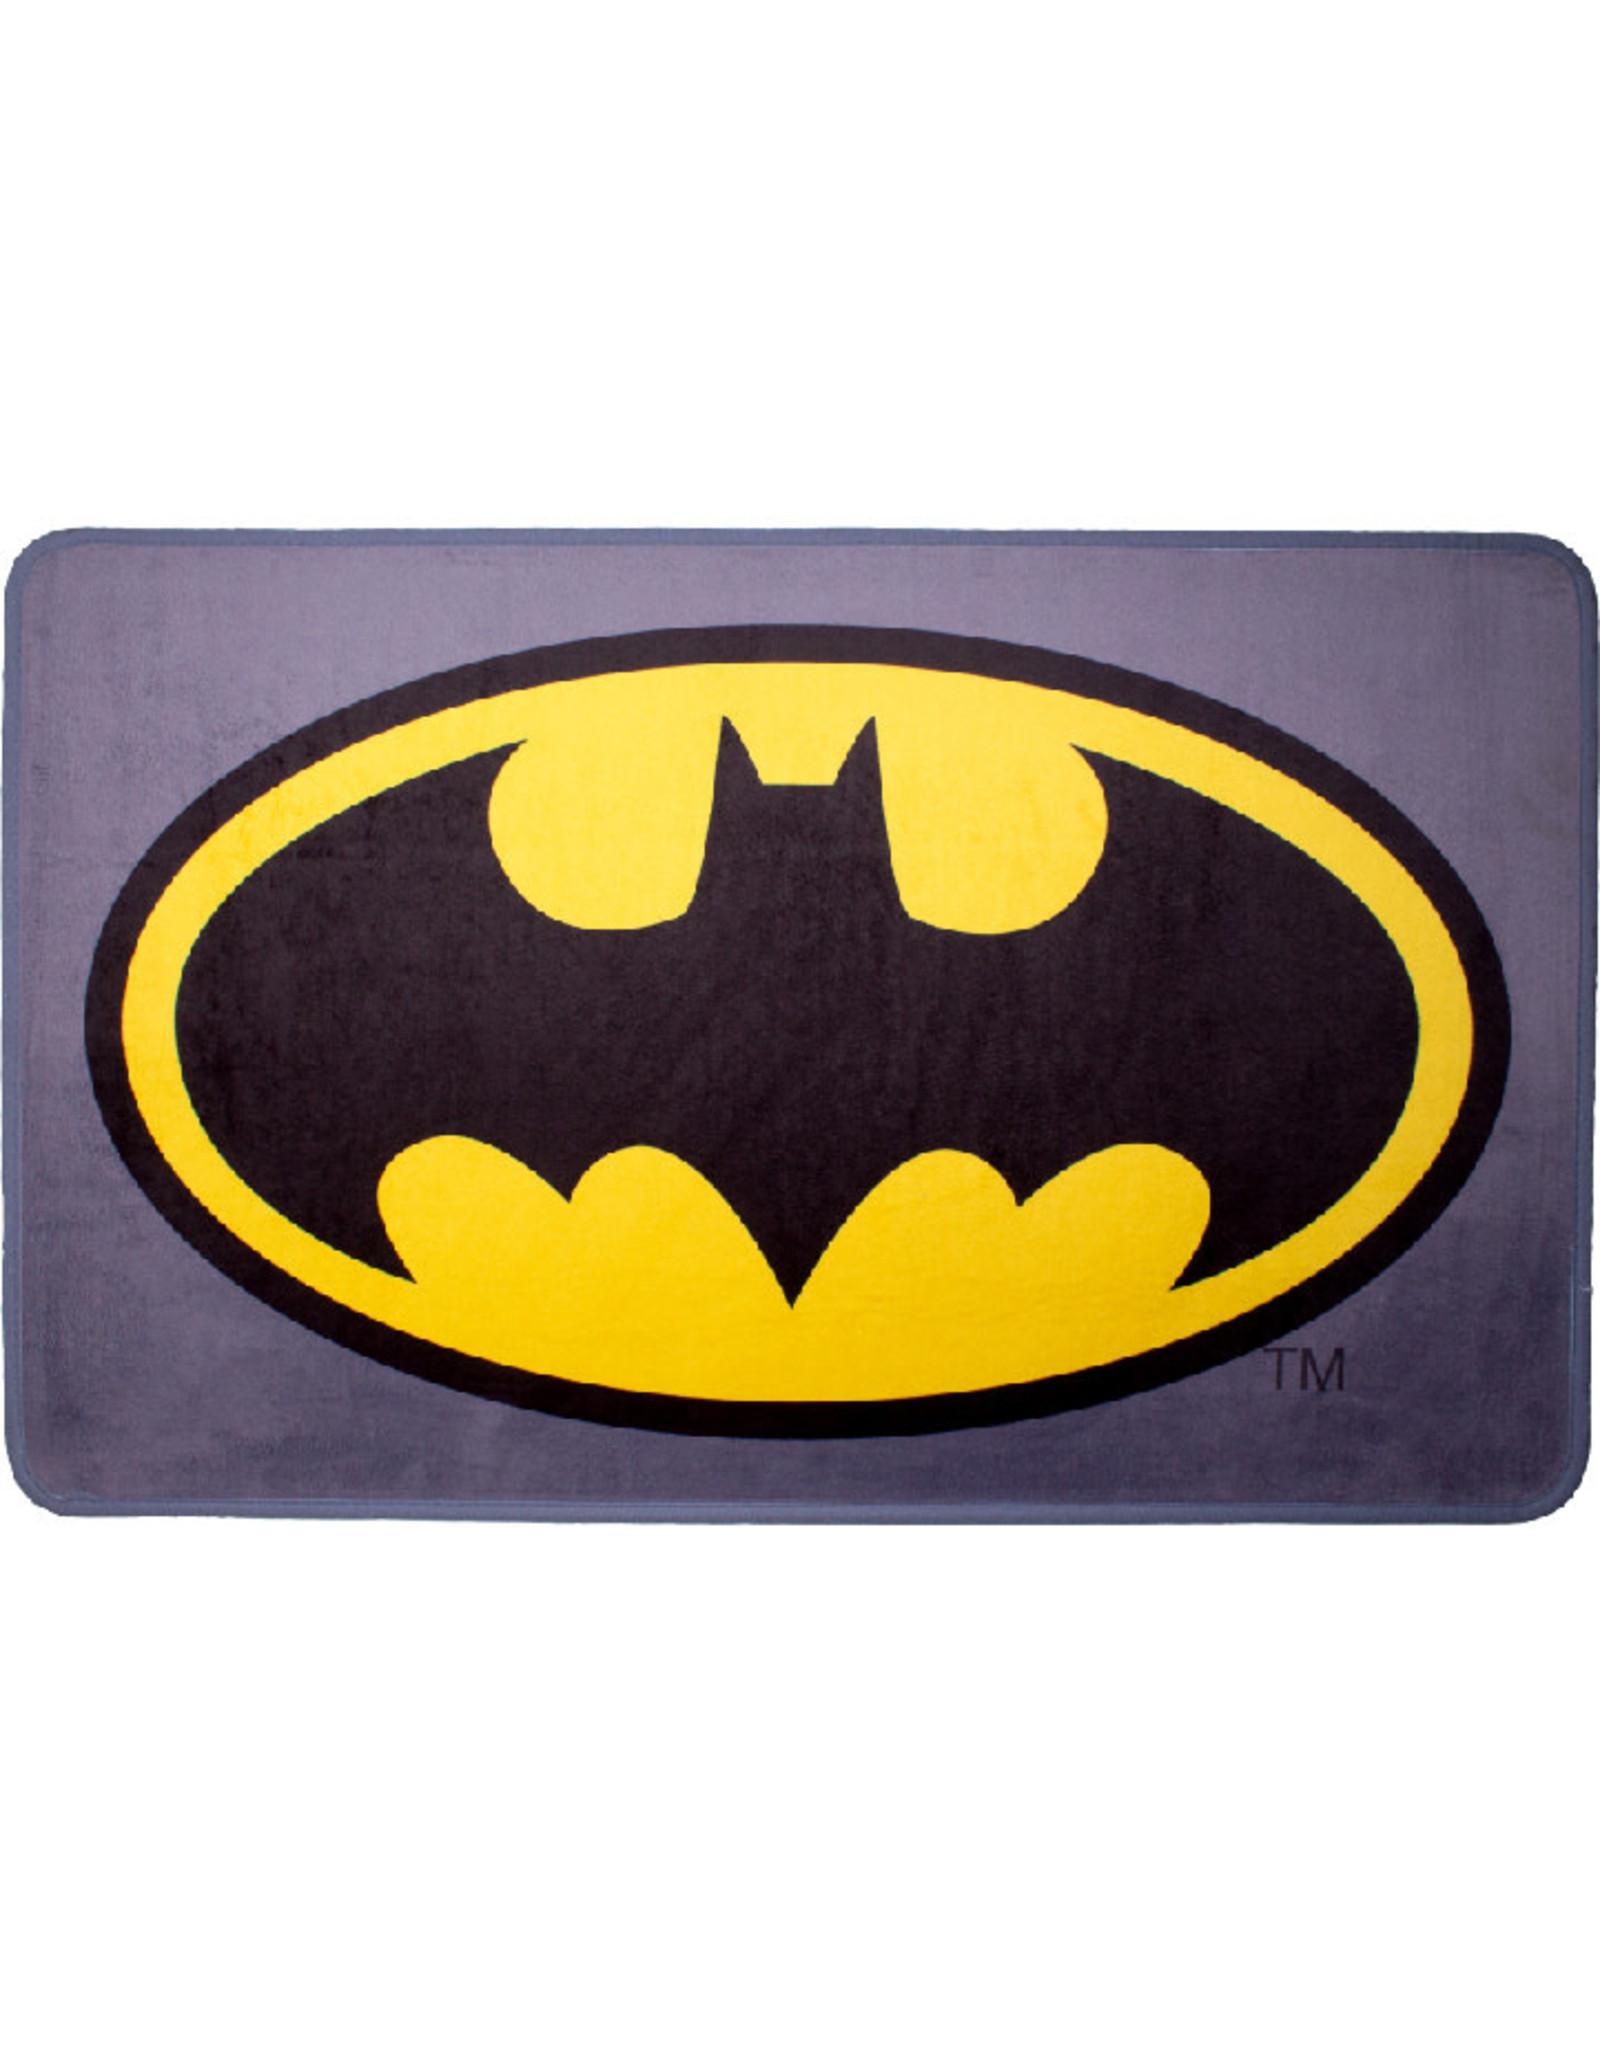 BATMAN Microfiber mat 70x50cm - Logo Batman